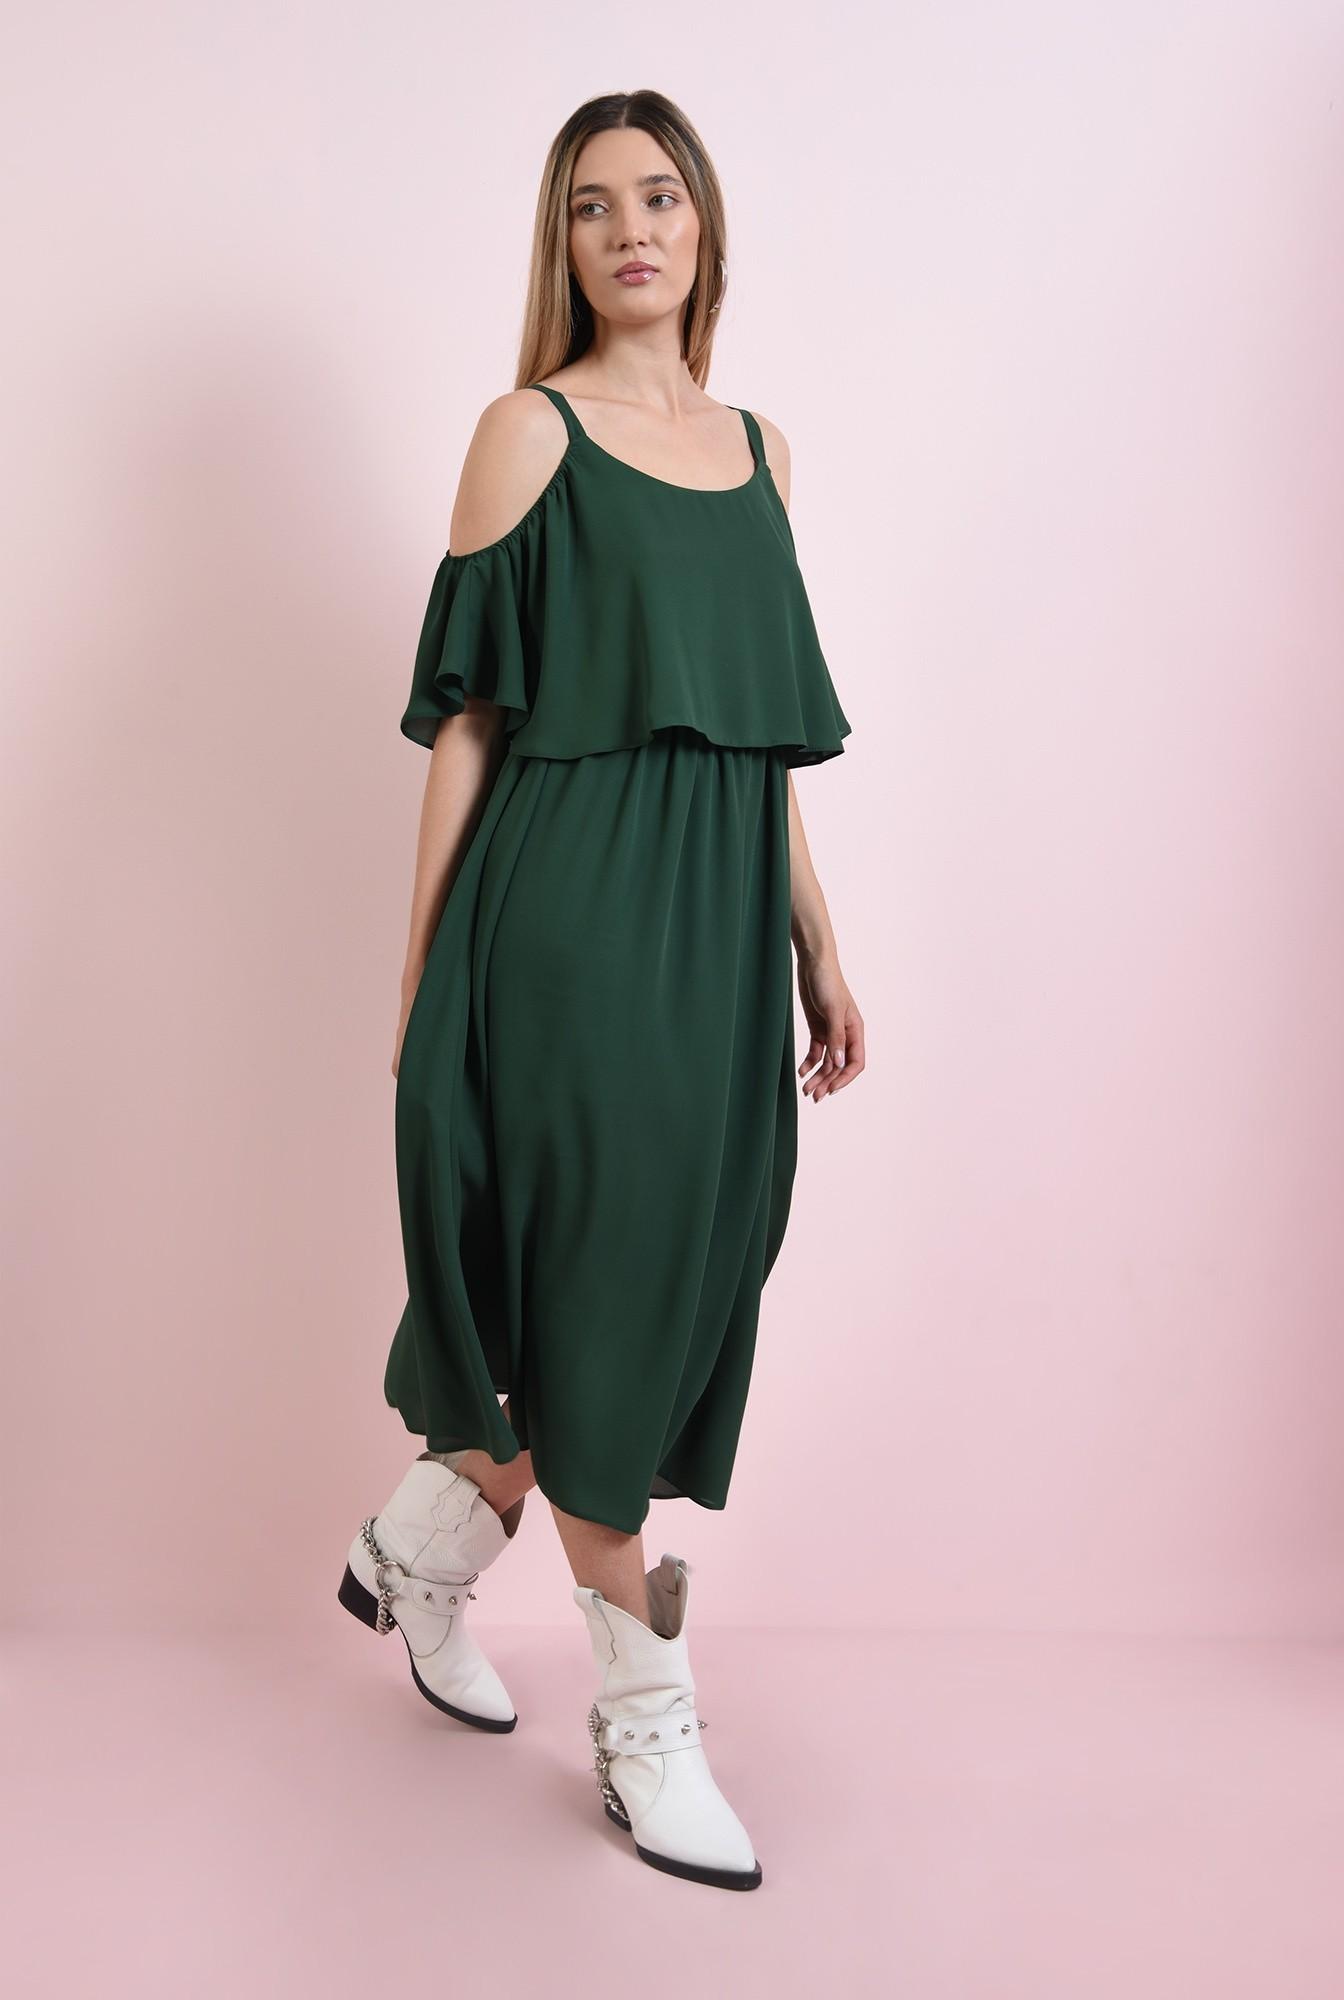 0 - rochie casual, verde, evazata